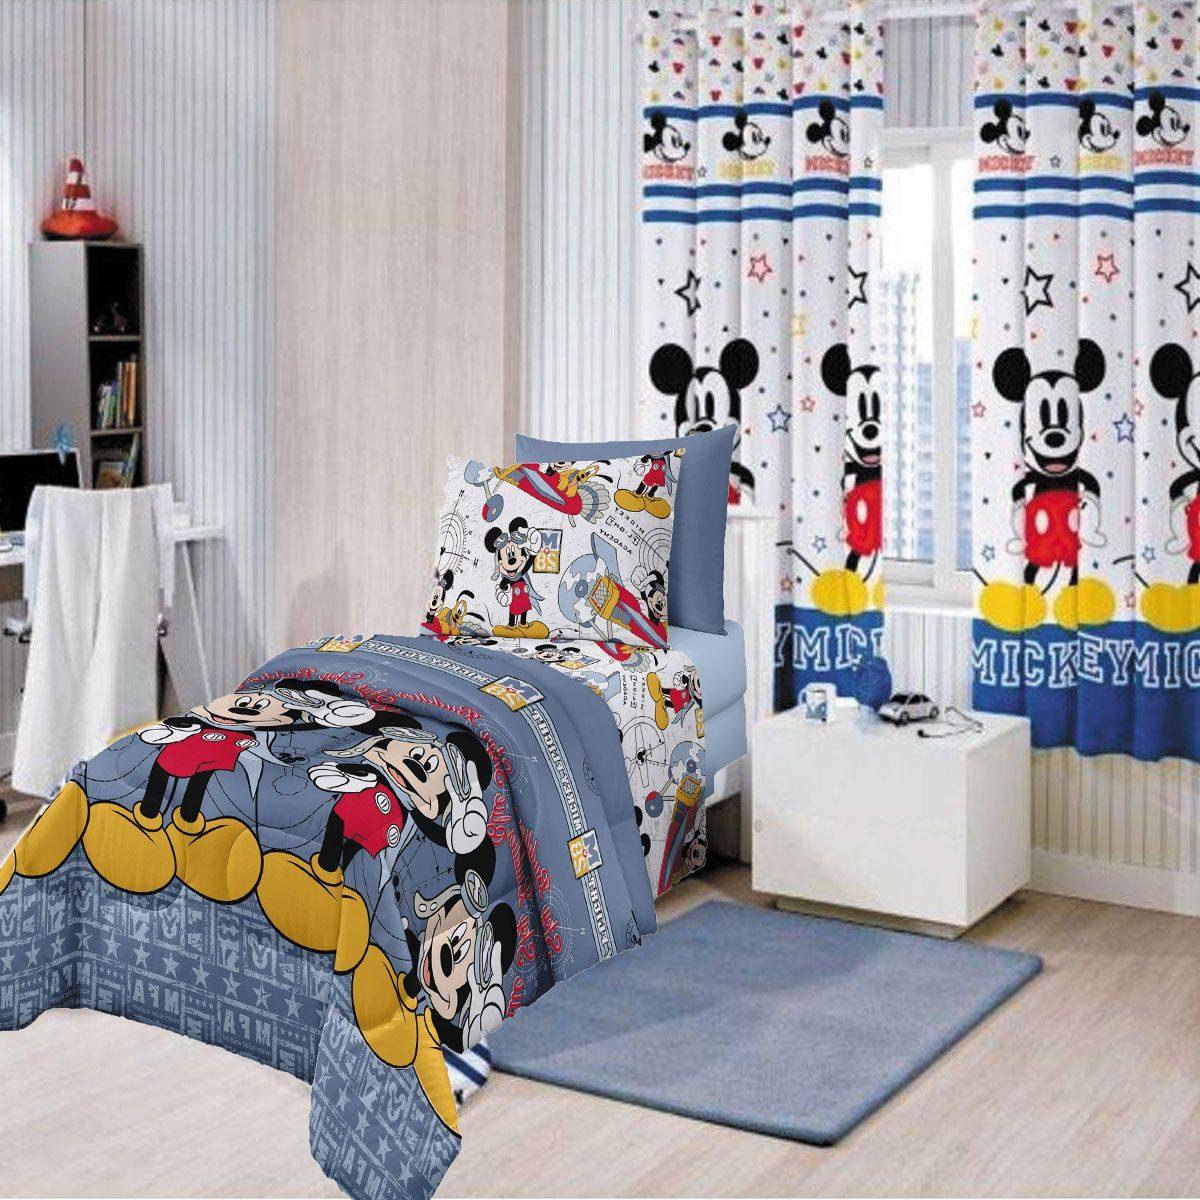 0c17cebbd8 kit infantil mickey jogo de cama + edredom + cortina disney. Carregando  zoom.